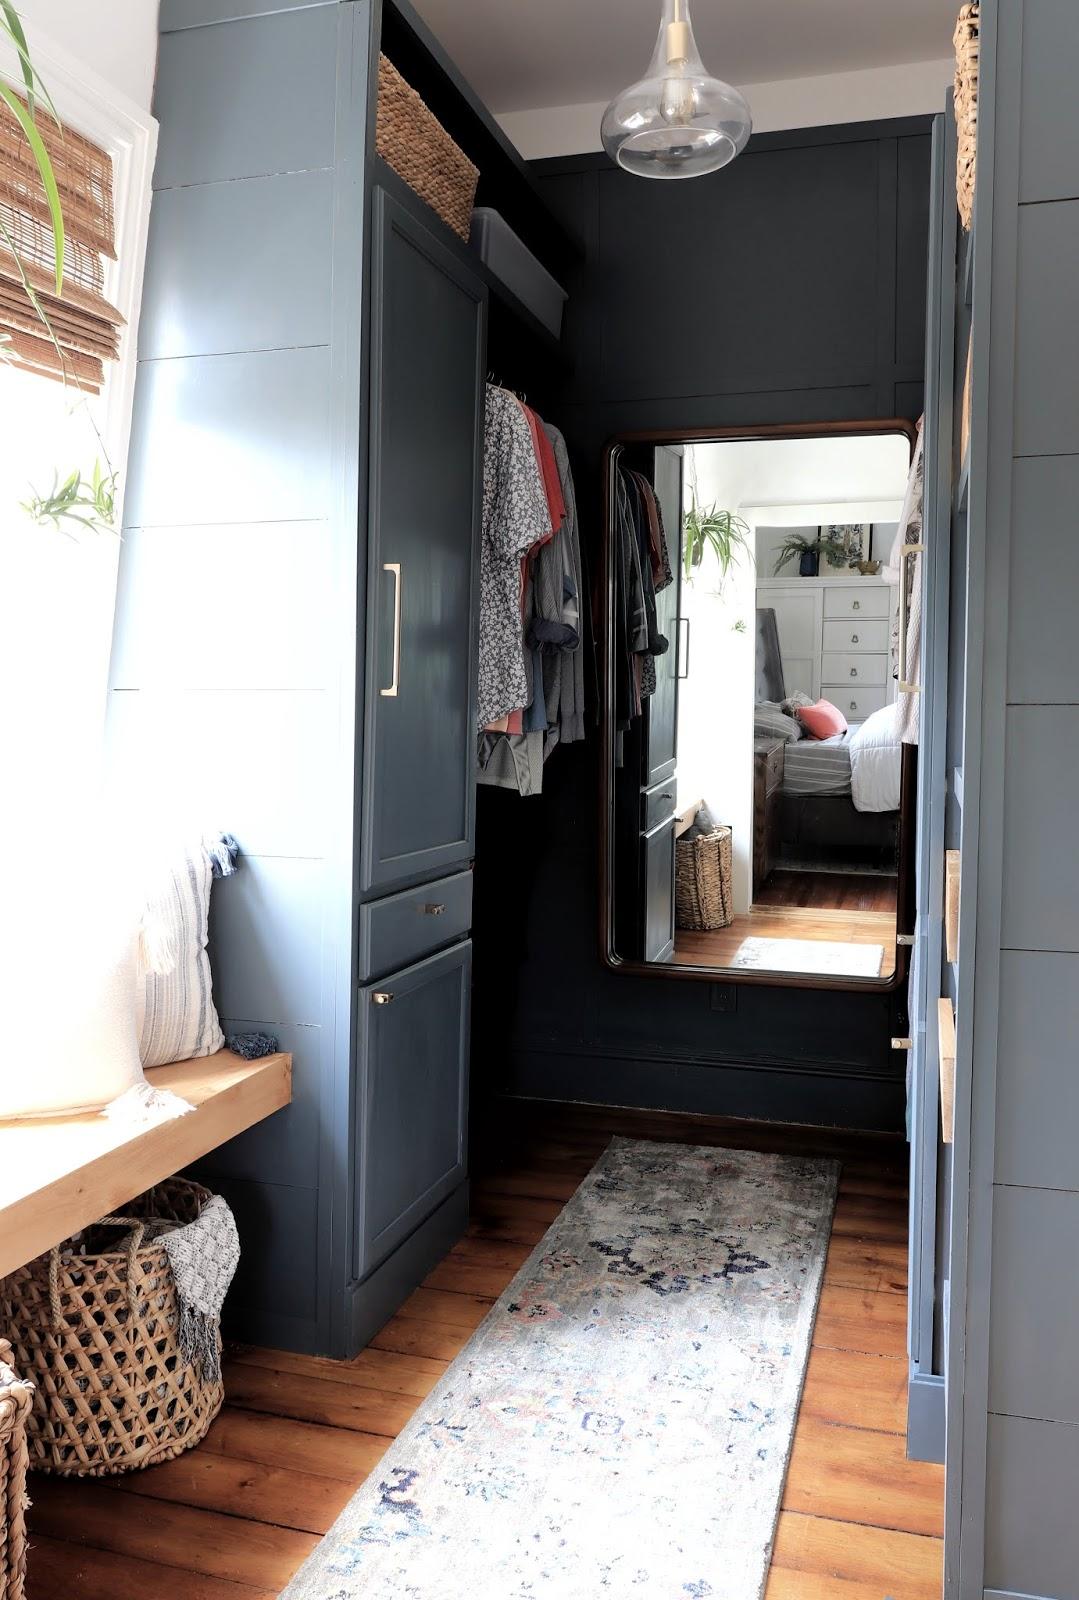 25 Diy Built Ins Using Prefab Bookcases Cabinets Making Lemonade